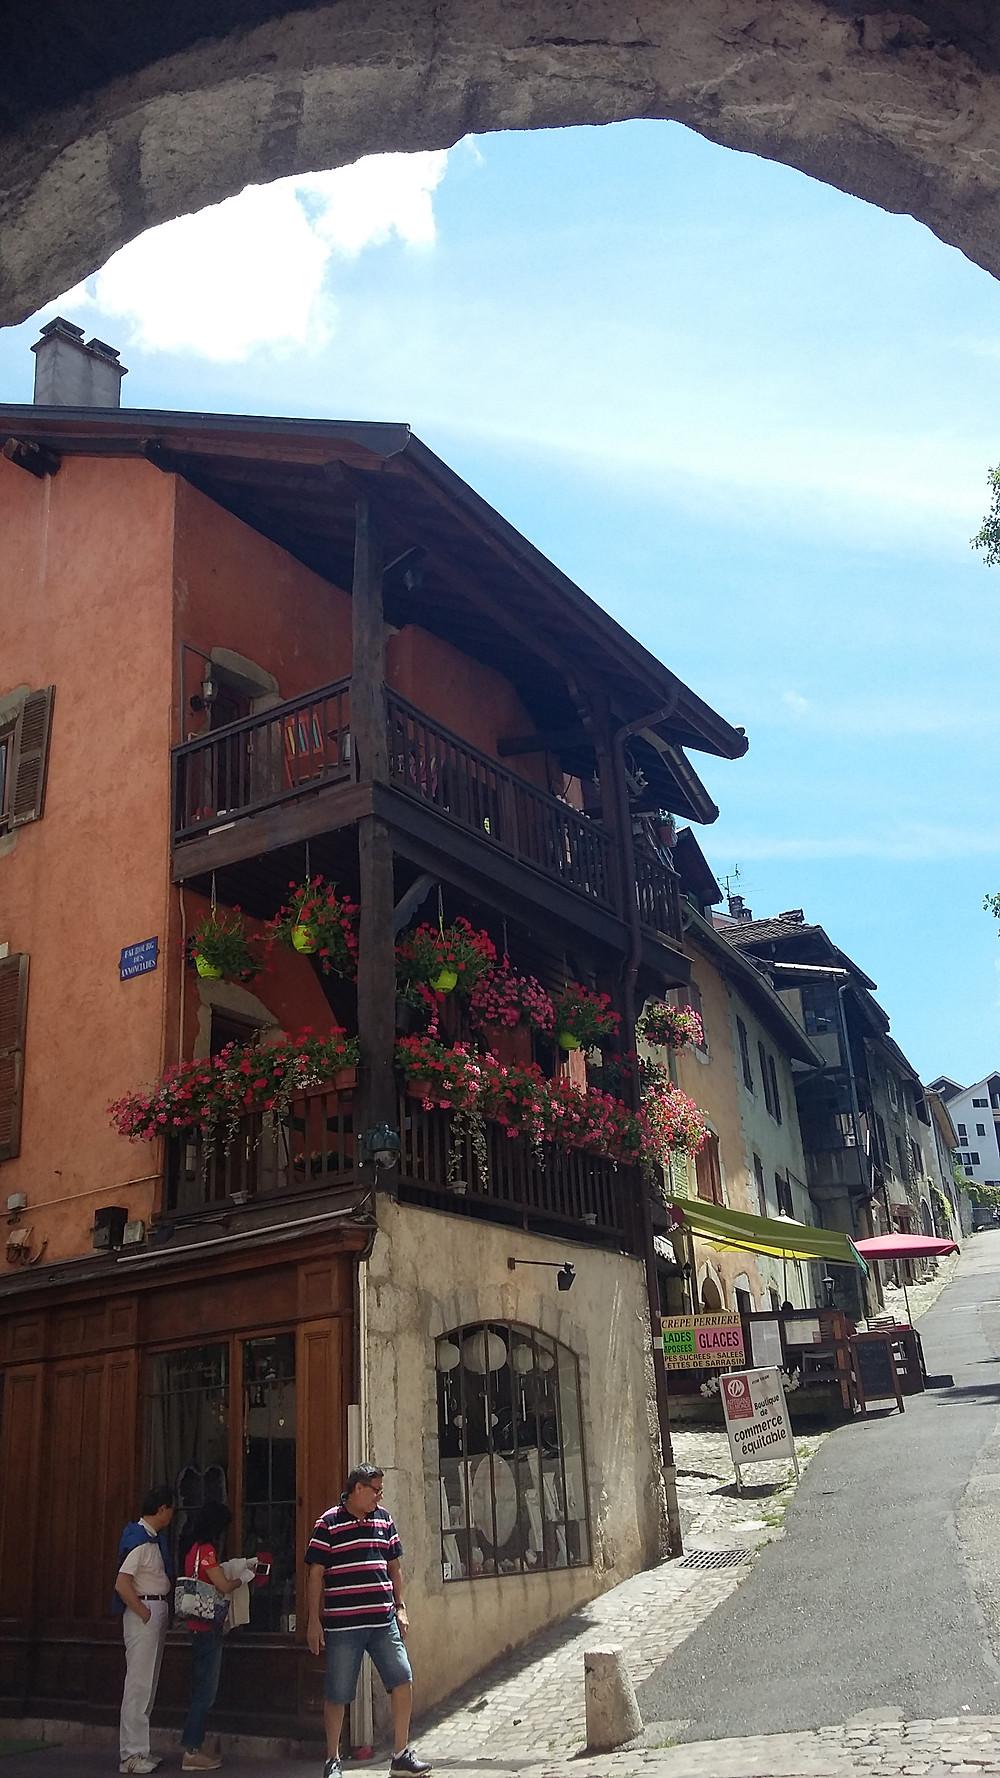 Perrière door in Old Town Annecy